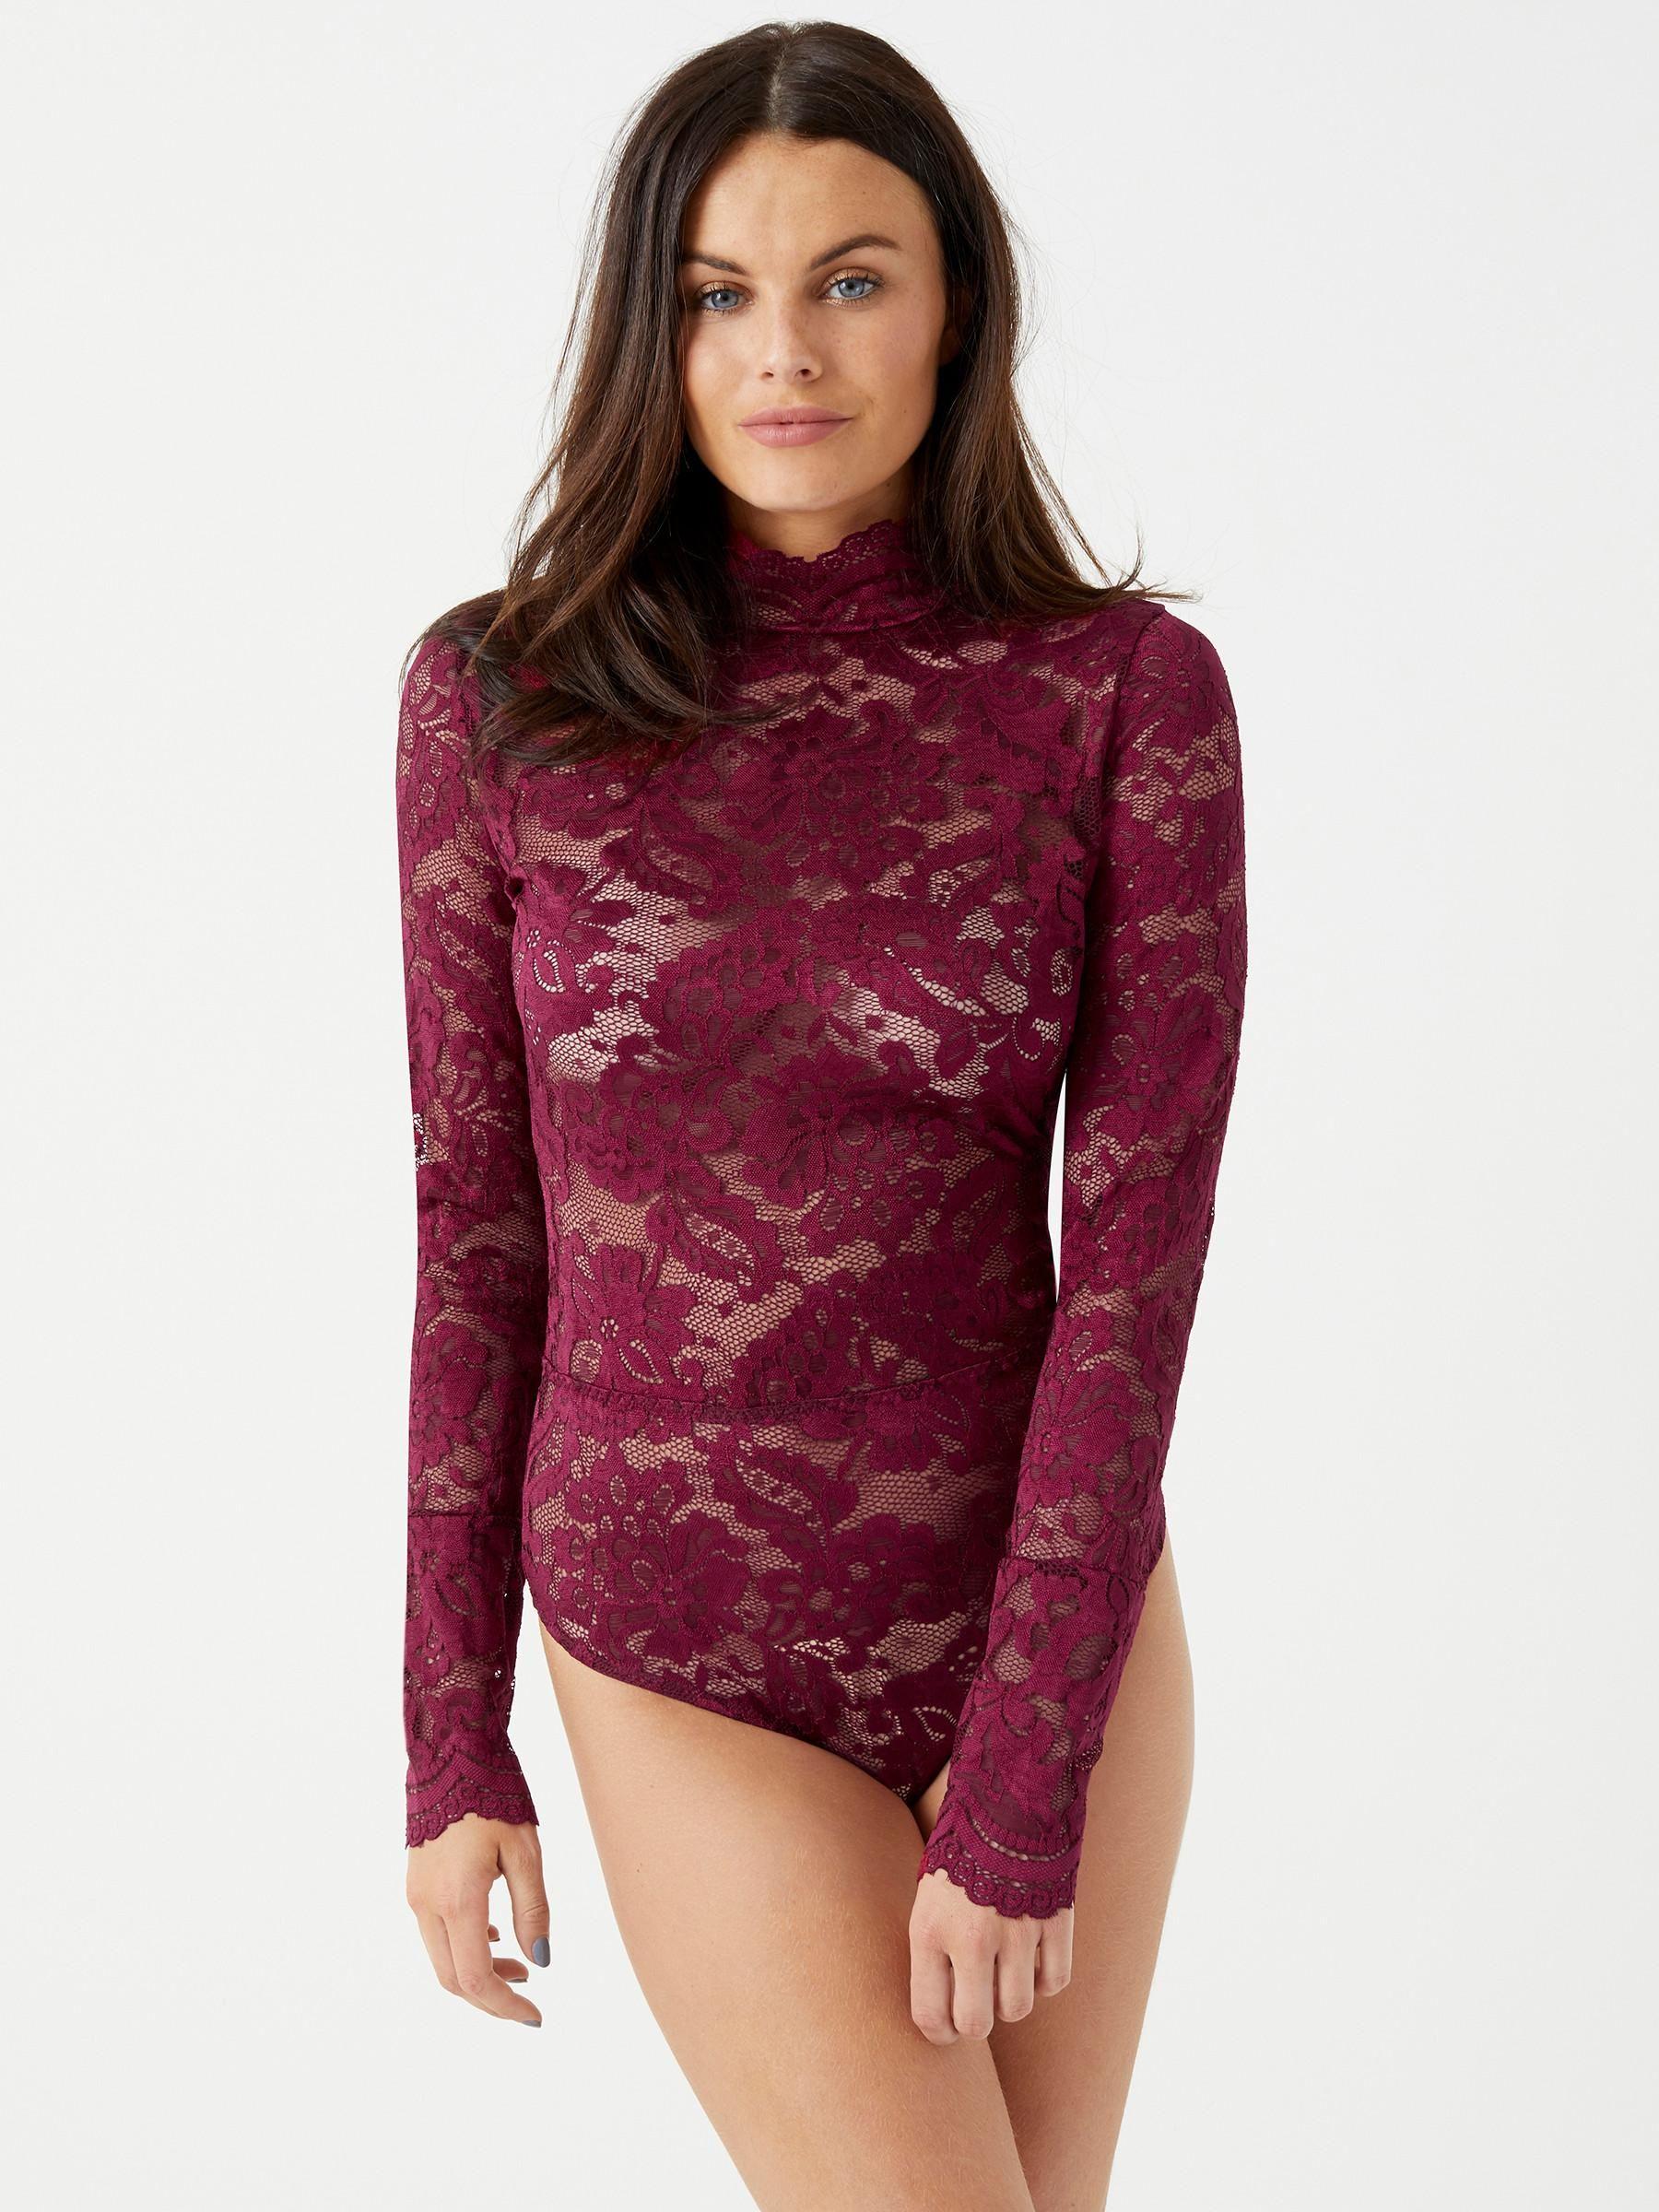 Lipsy Burgundy bodysuit £12 @ Ann Summers (Free C&C)